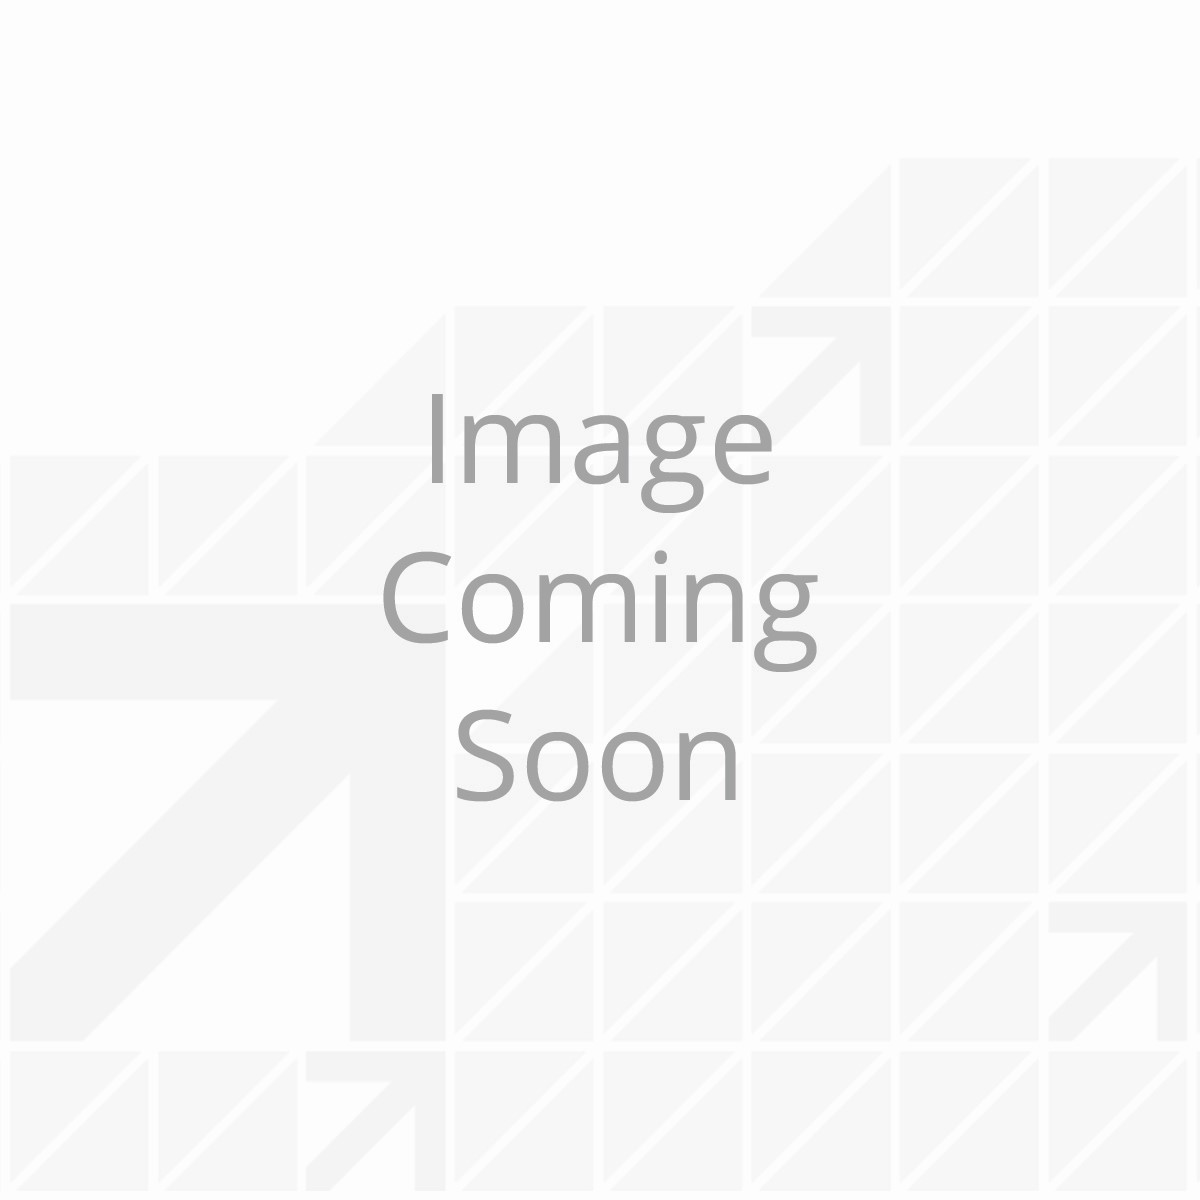 BikeBase™ Tongue Adapter